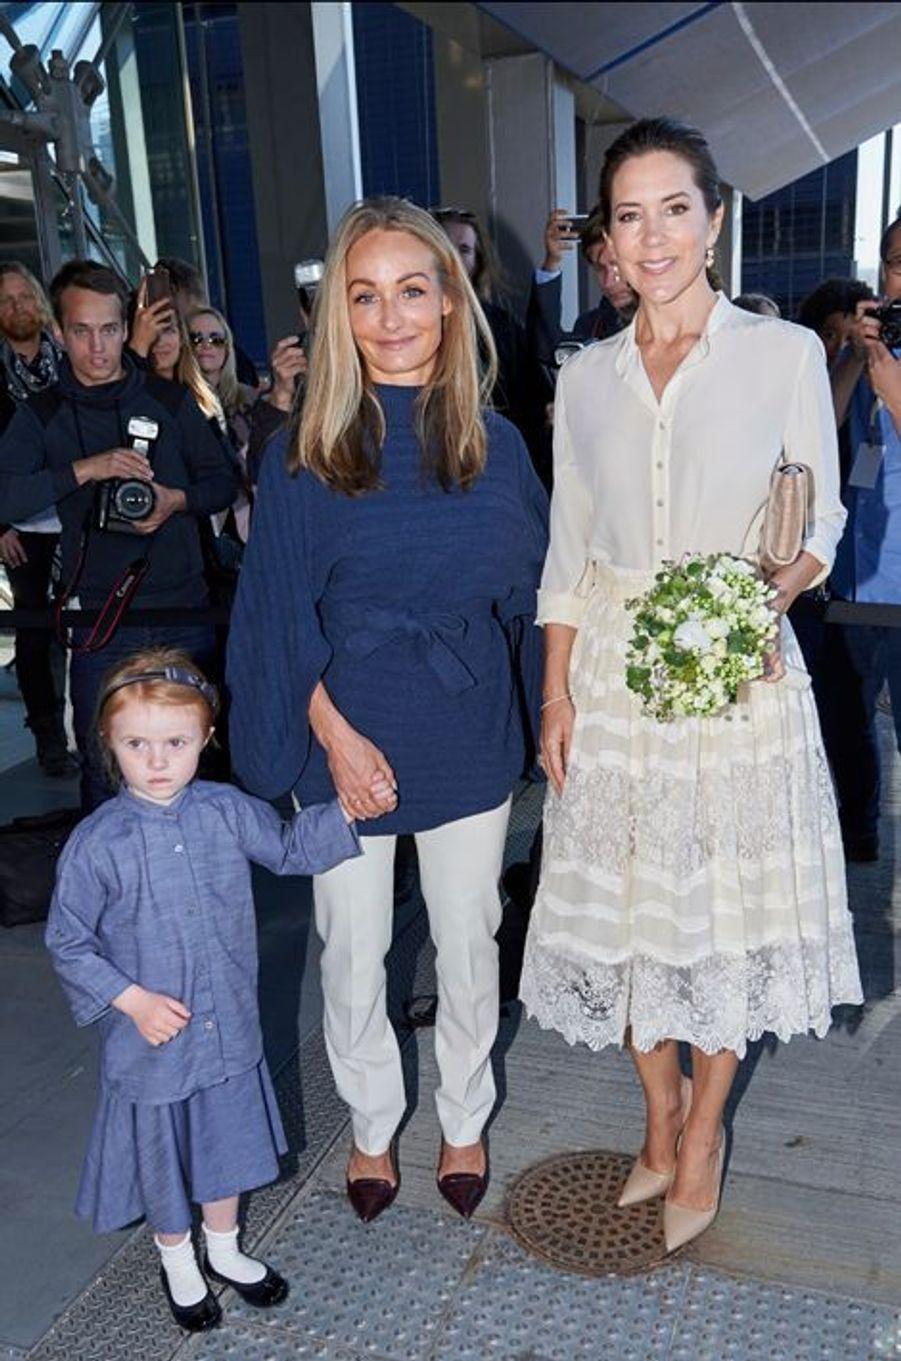 La princesse Mary de Danemark à Copenhague, le 12 mai 2016